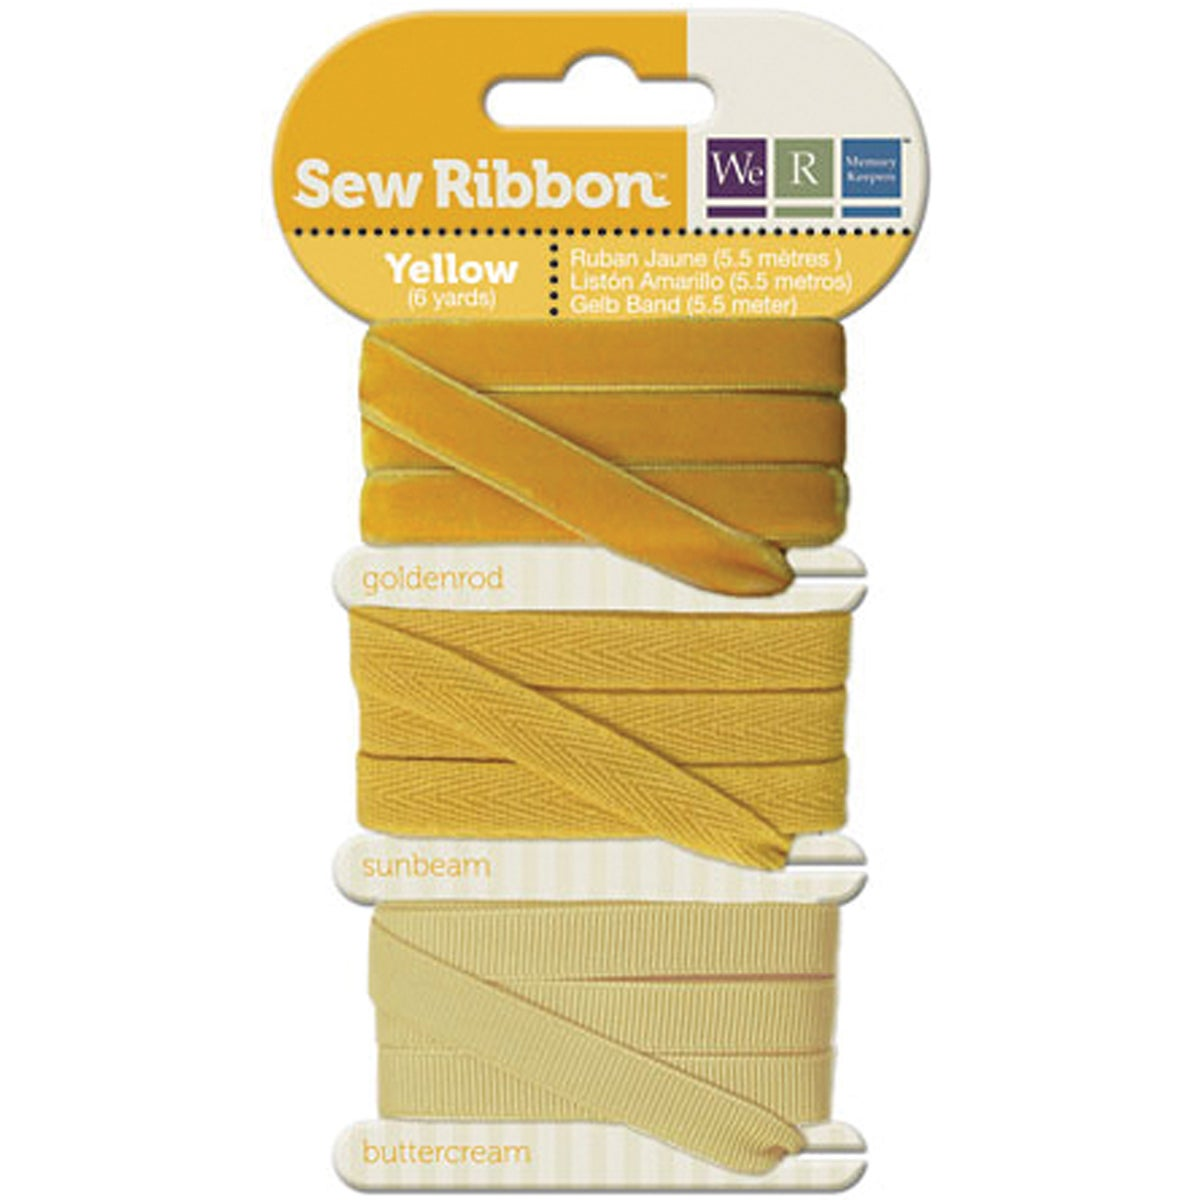 We R Memory Keepers Sew Ribbon Yellow Ribbon (6 yards)